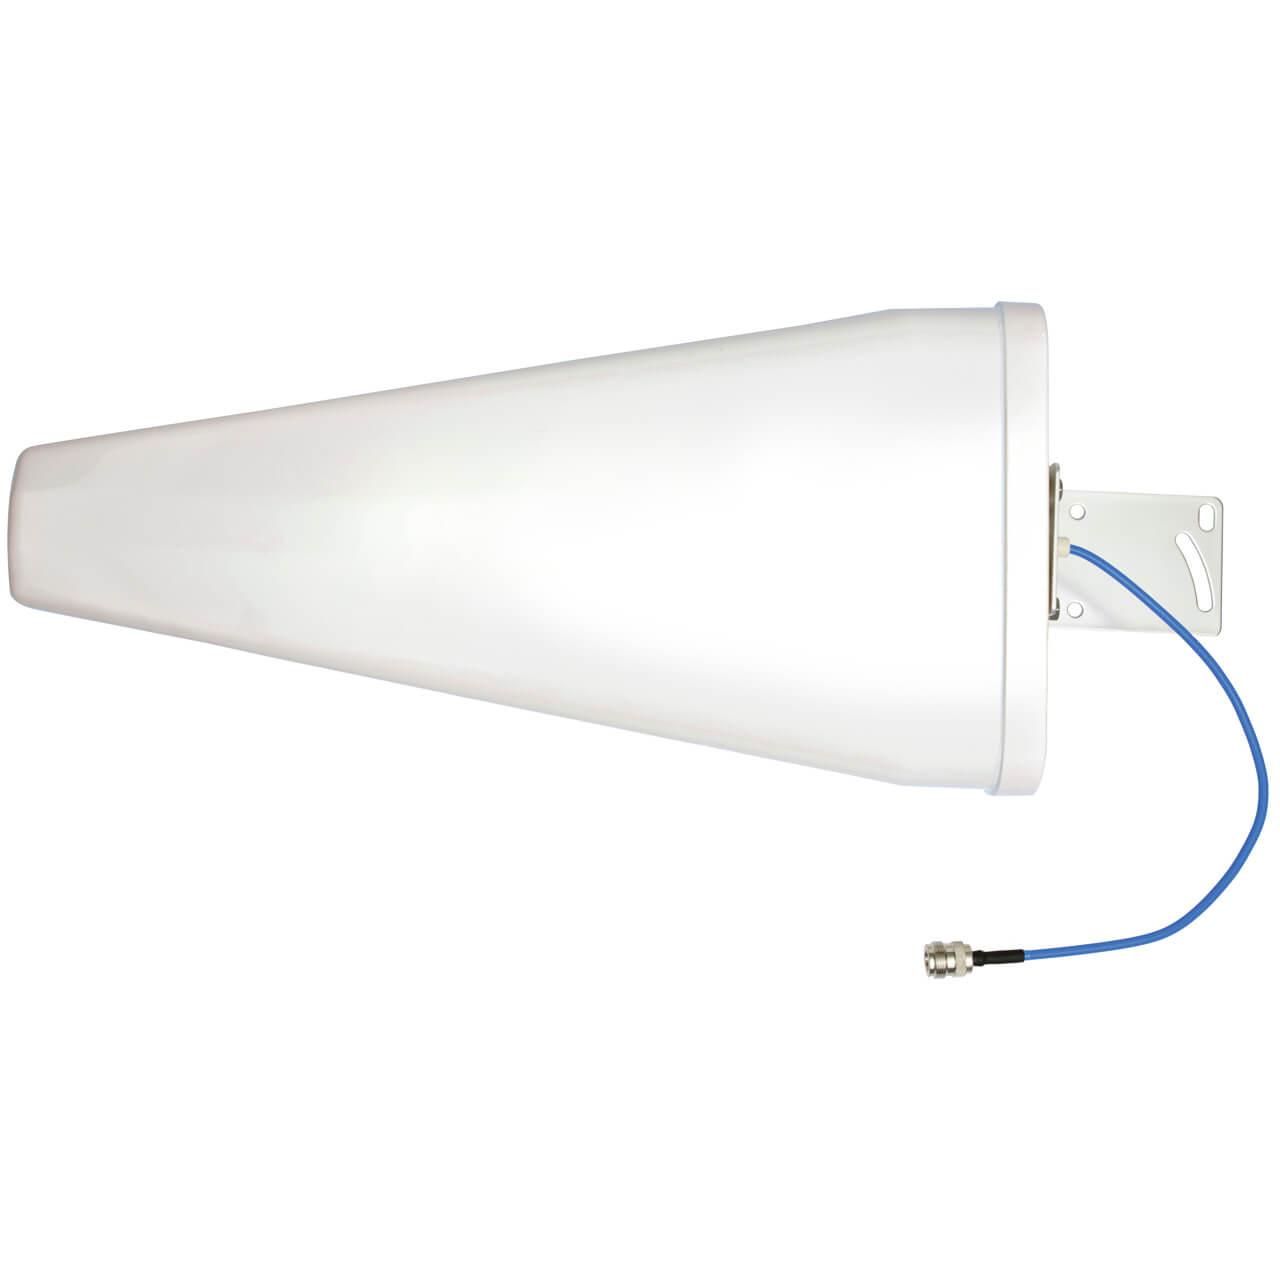 The Quicksilver 5G Yagi Directional Antenna